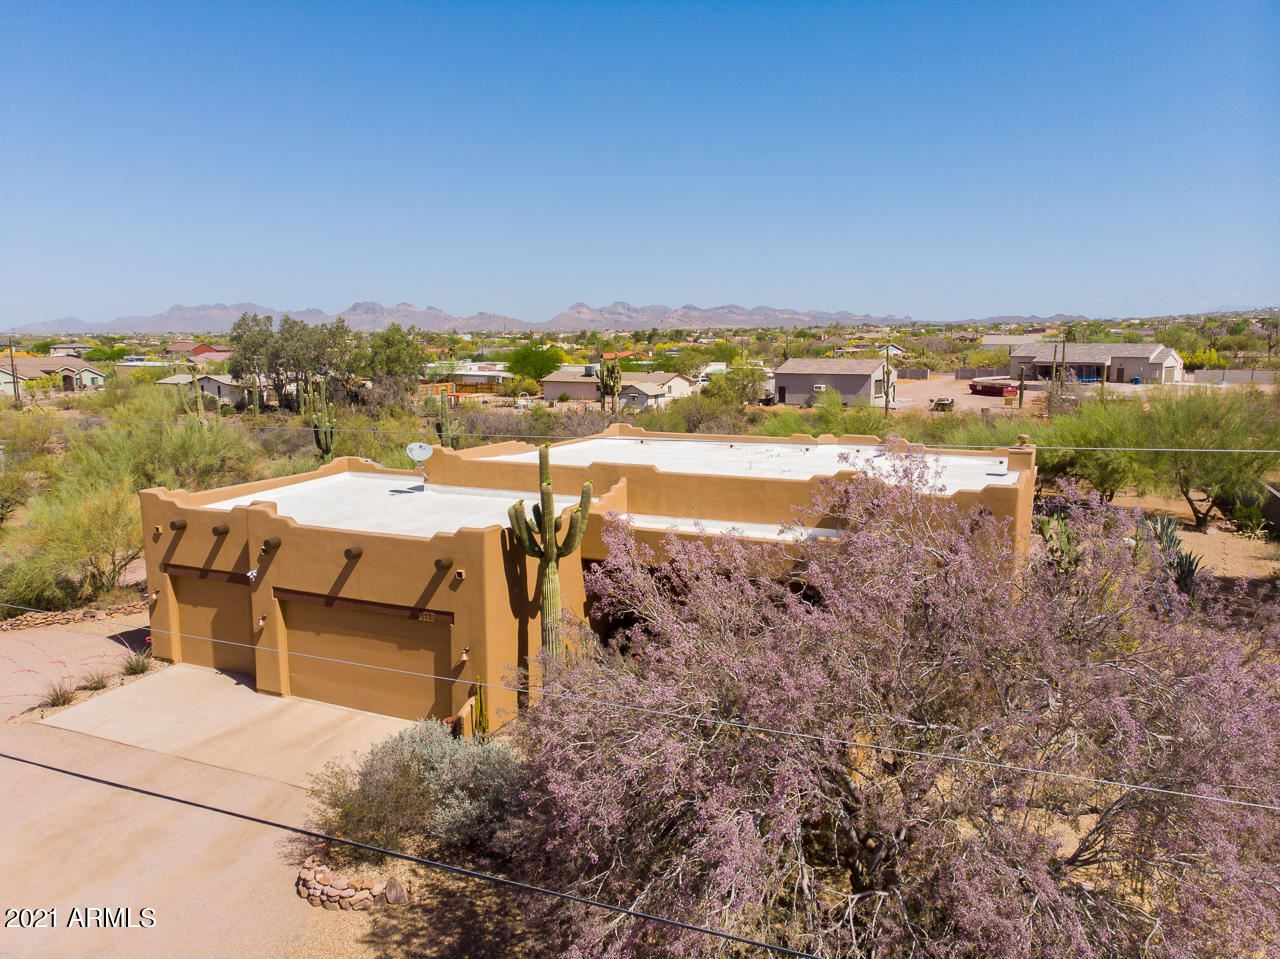 Photo of 5580 E 18TH Avenue, Apache Junction, AZ 85119 (MLS # 6231870)